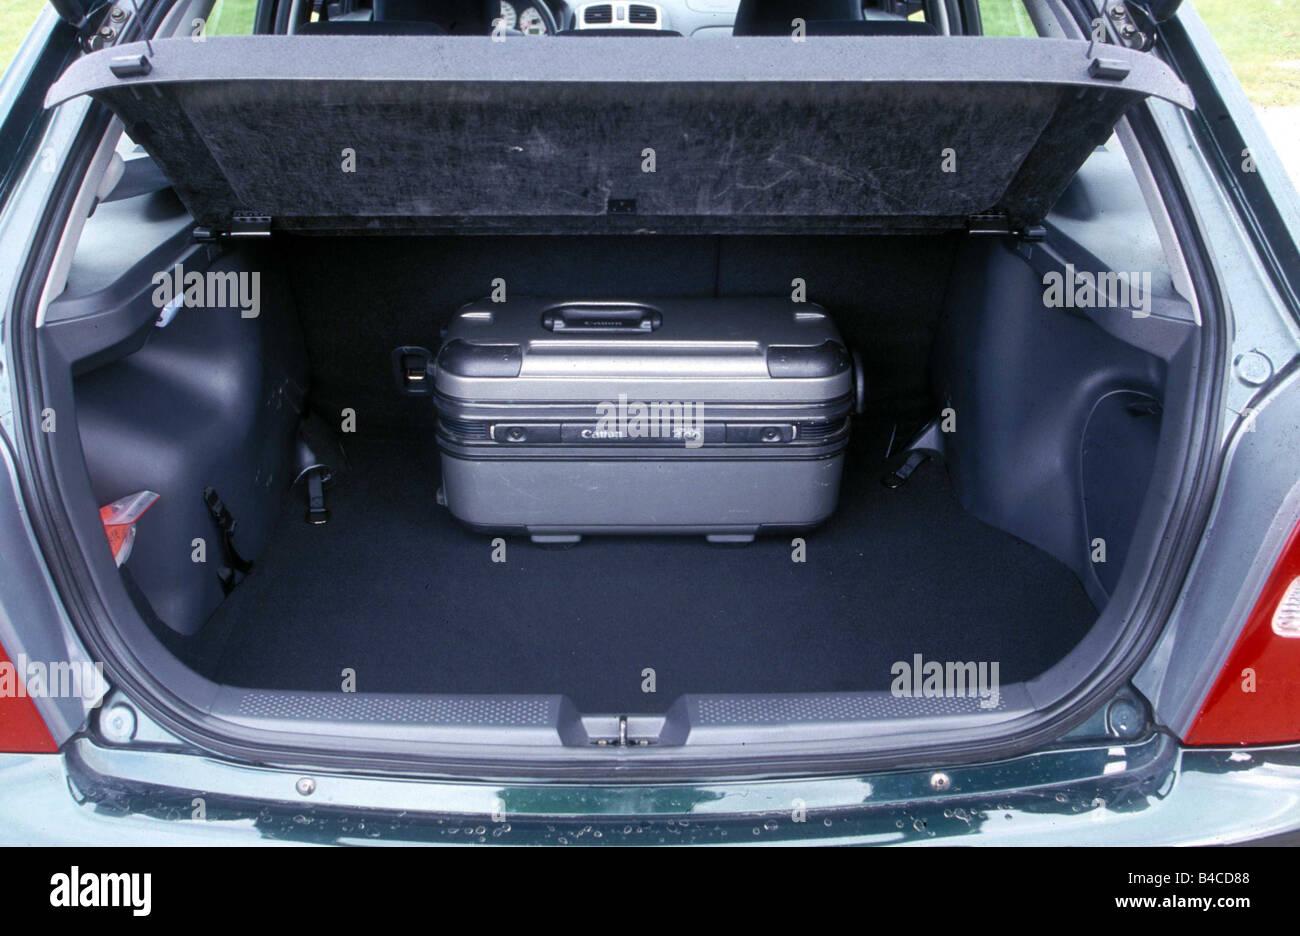 Auto, Mazda 323 F, untere mittlere Klasse, Limousine, Modelljahr ...